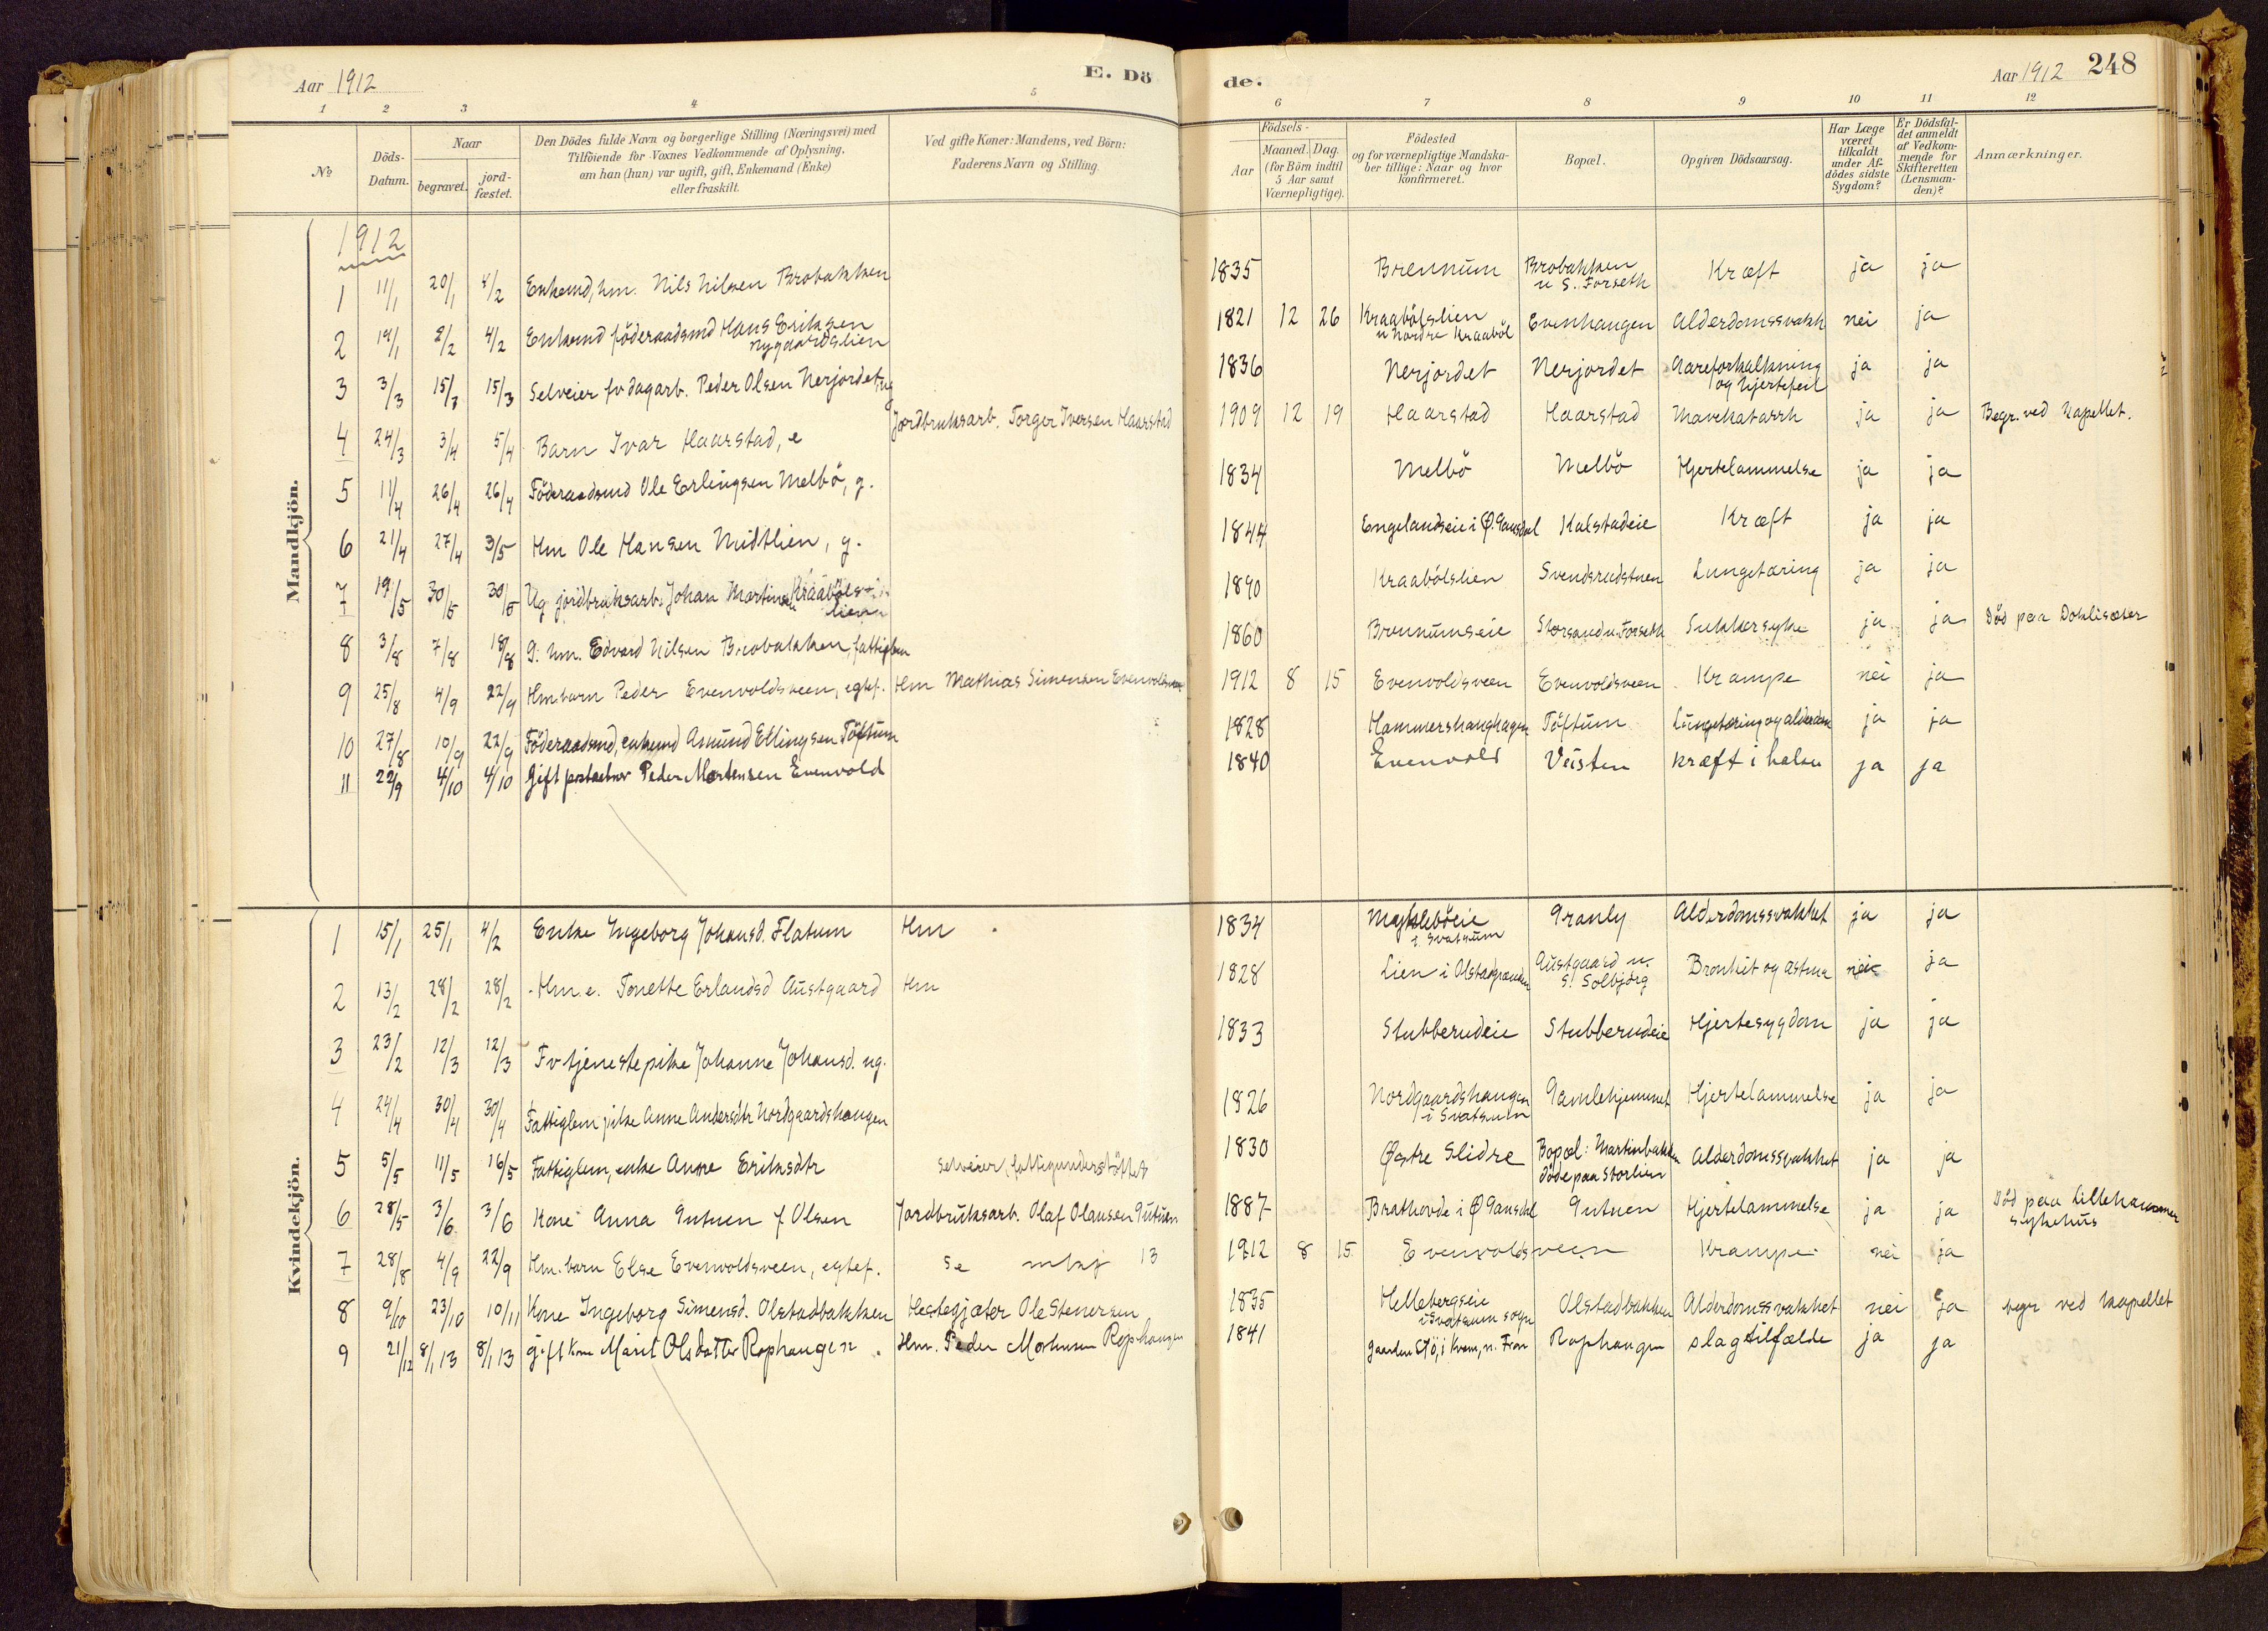 SAH, Vestre Gausdal prestekontor, Ministerialbok nr. 1, 1887-1914, s. 248